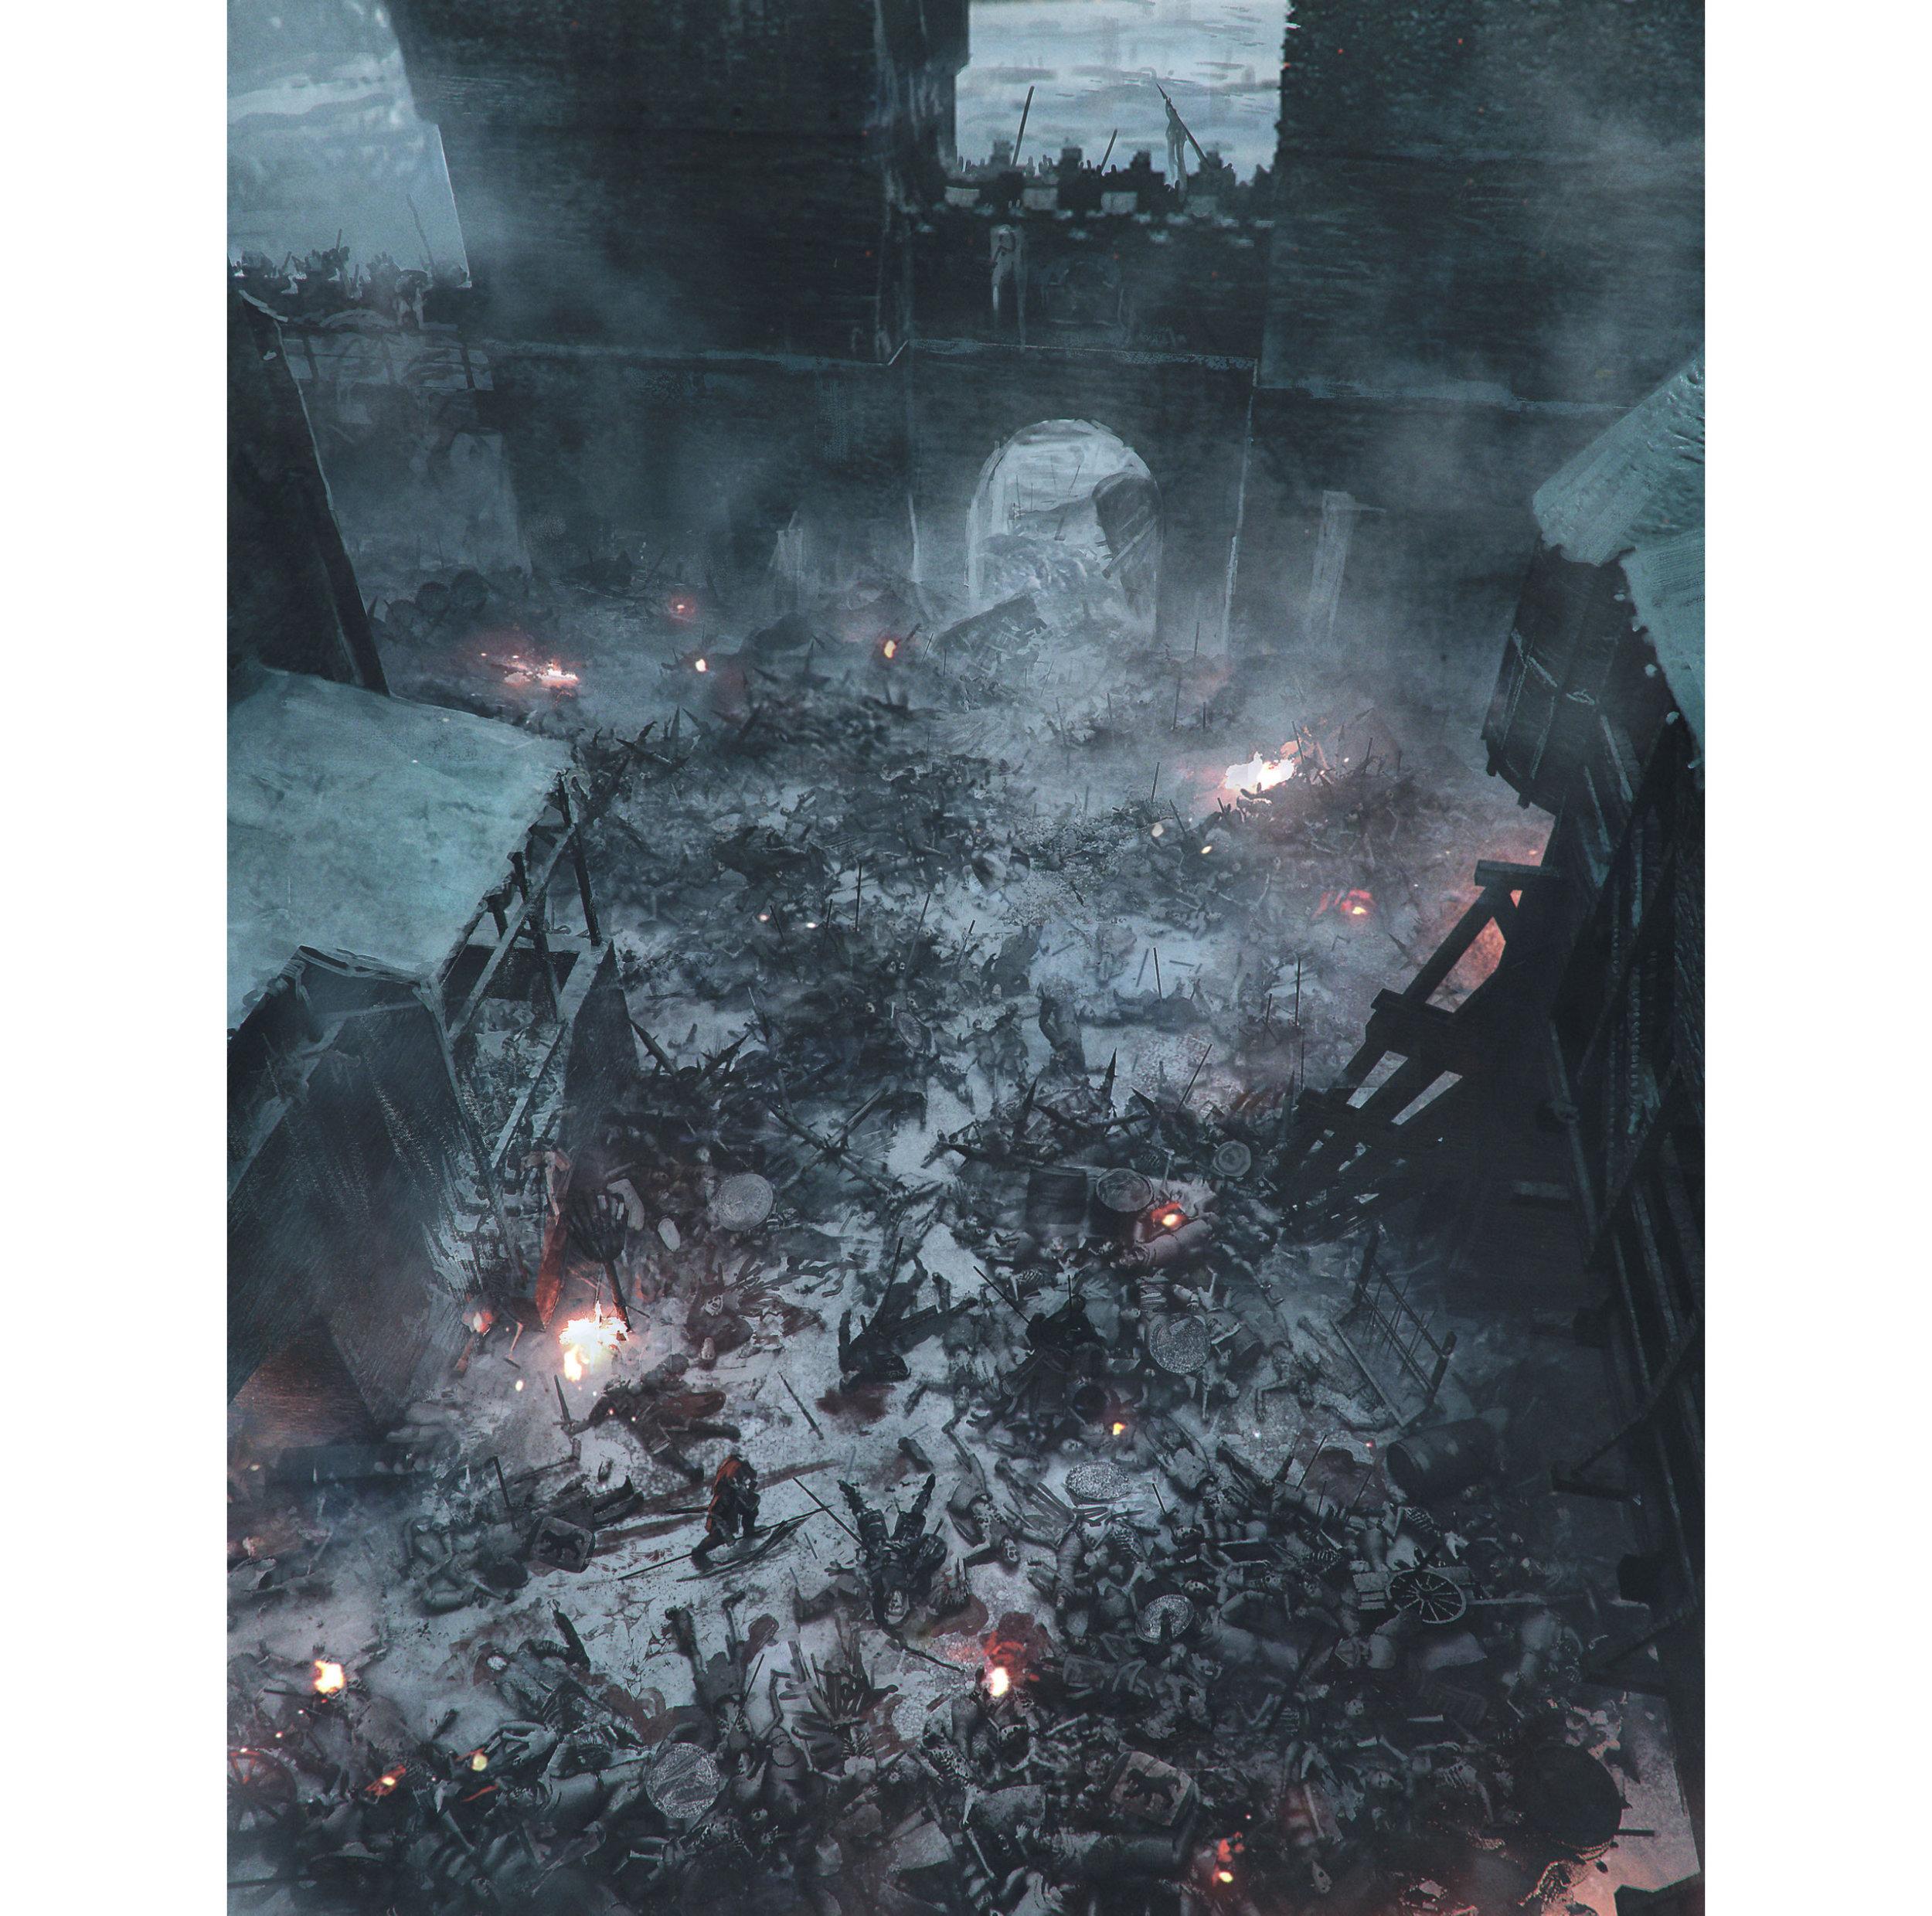 GOT8_Winterfell_Dawn_005b_sharpened_ps2copy.jpg